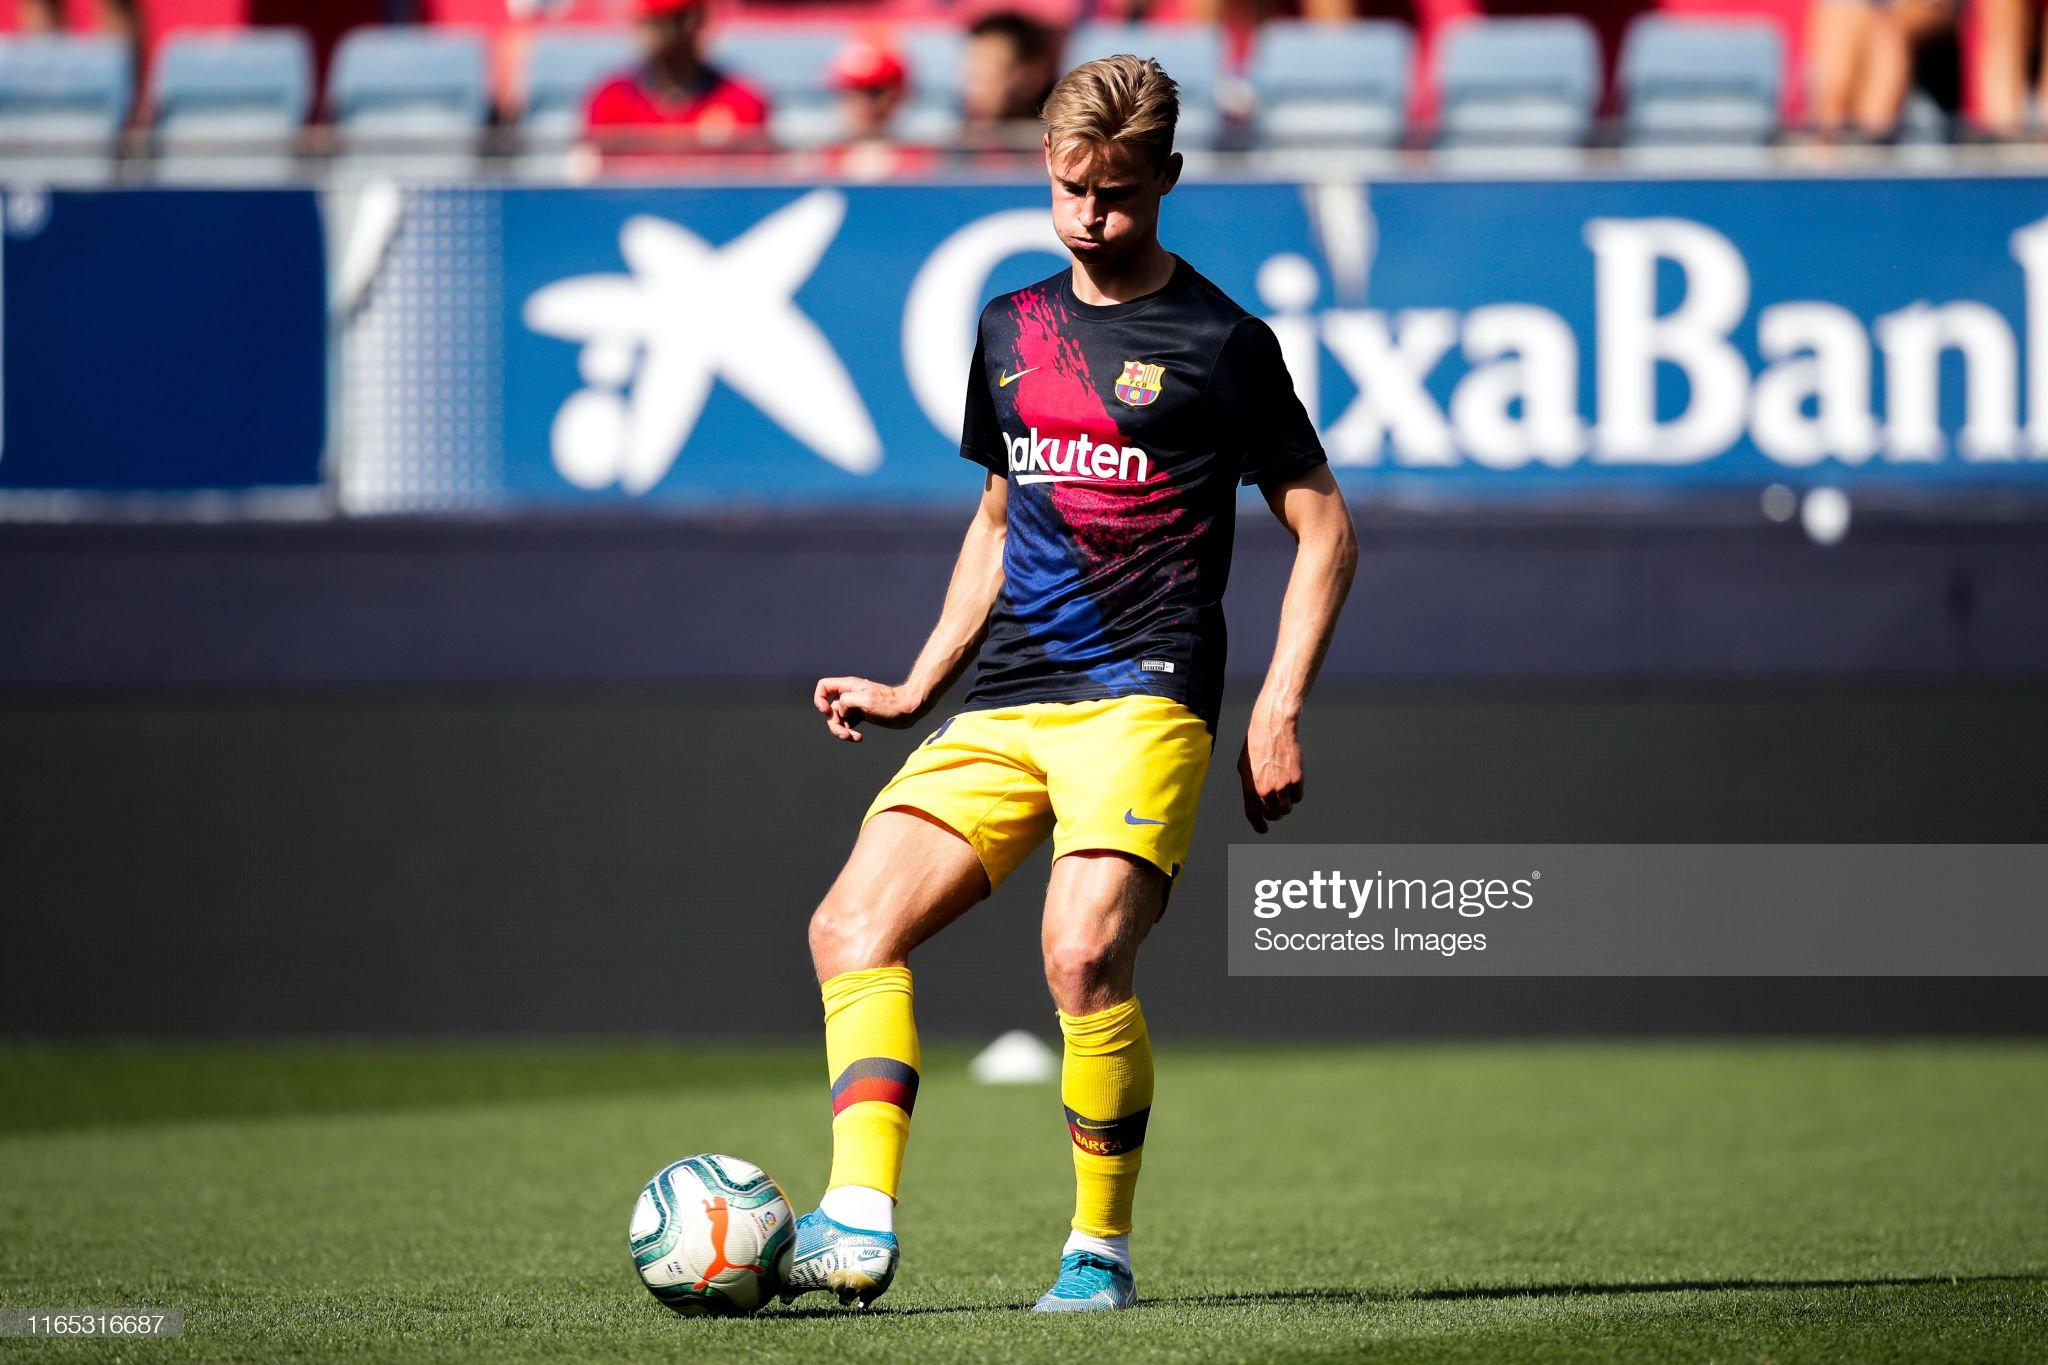 صور مباراة : أوساسونا - برشلونة 2-2 ( 31-08-2019 )  Frenkie-de-jong-of-fc-barcelona-during-the-la-liga-santander-match-picture-id1165316687?s=2048x2048